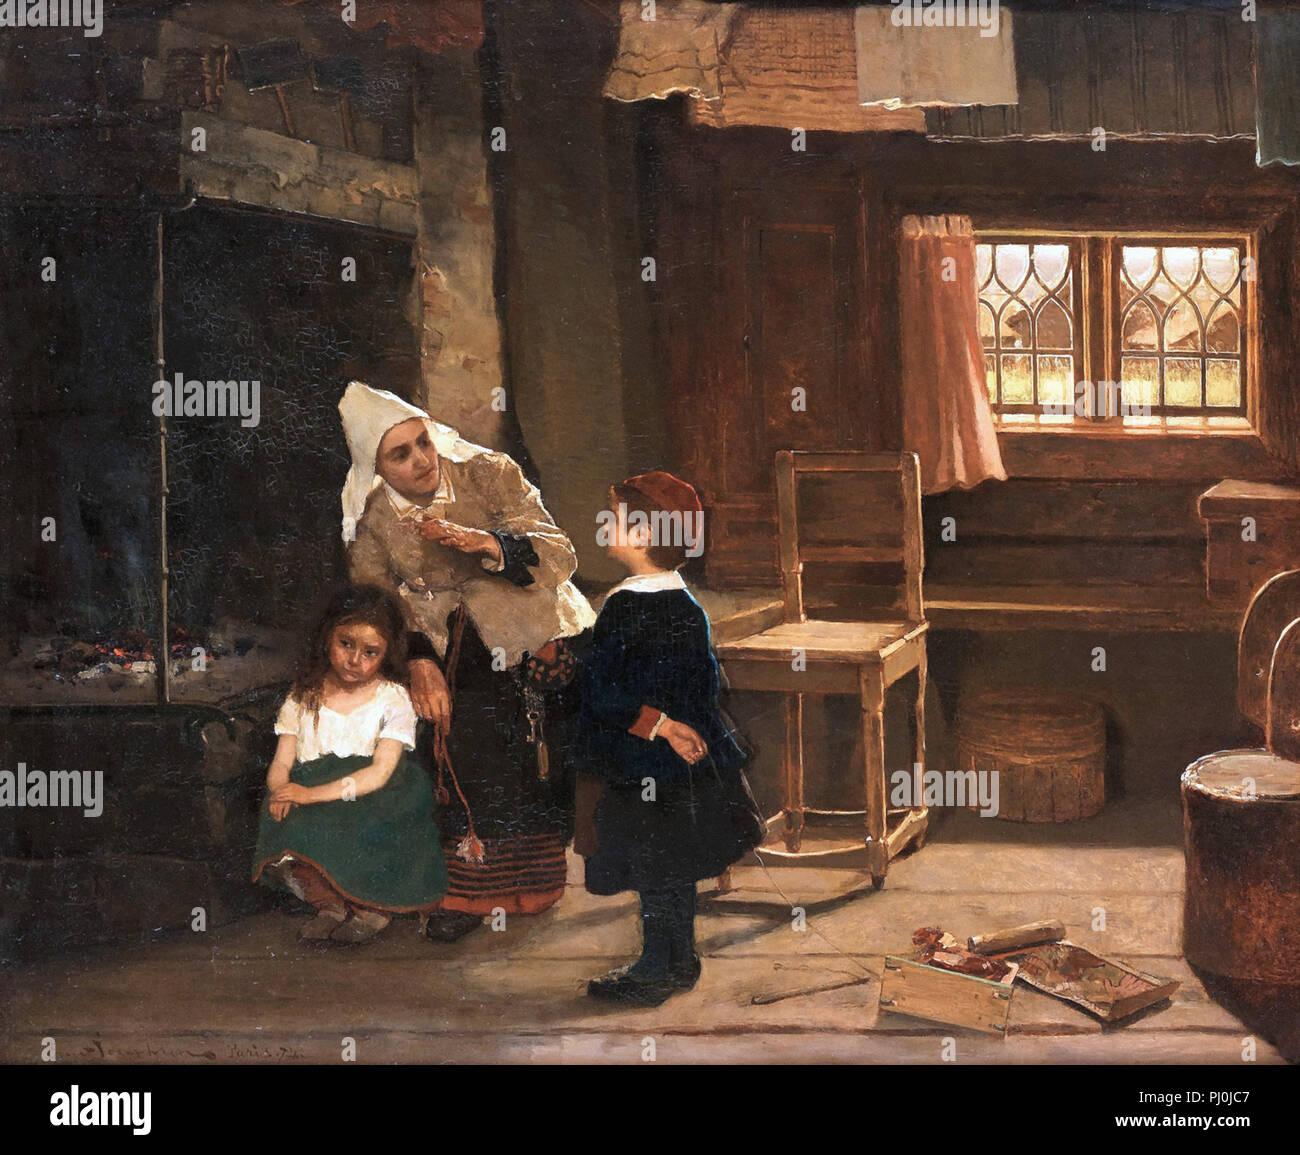 Josephson  Ernst - Sagoberätterskan - Interiör Frùe5n Dalarna - Stock Image